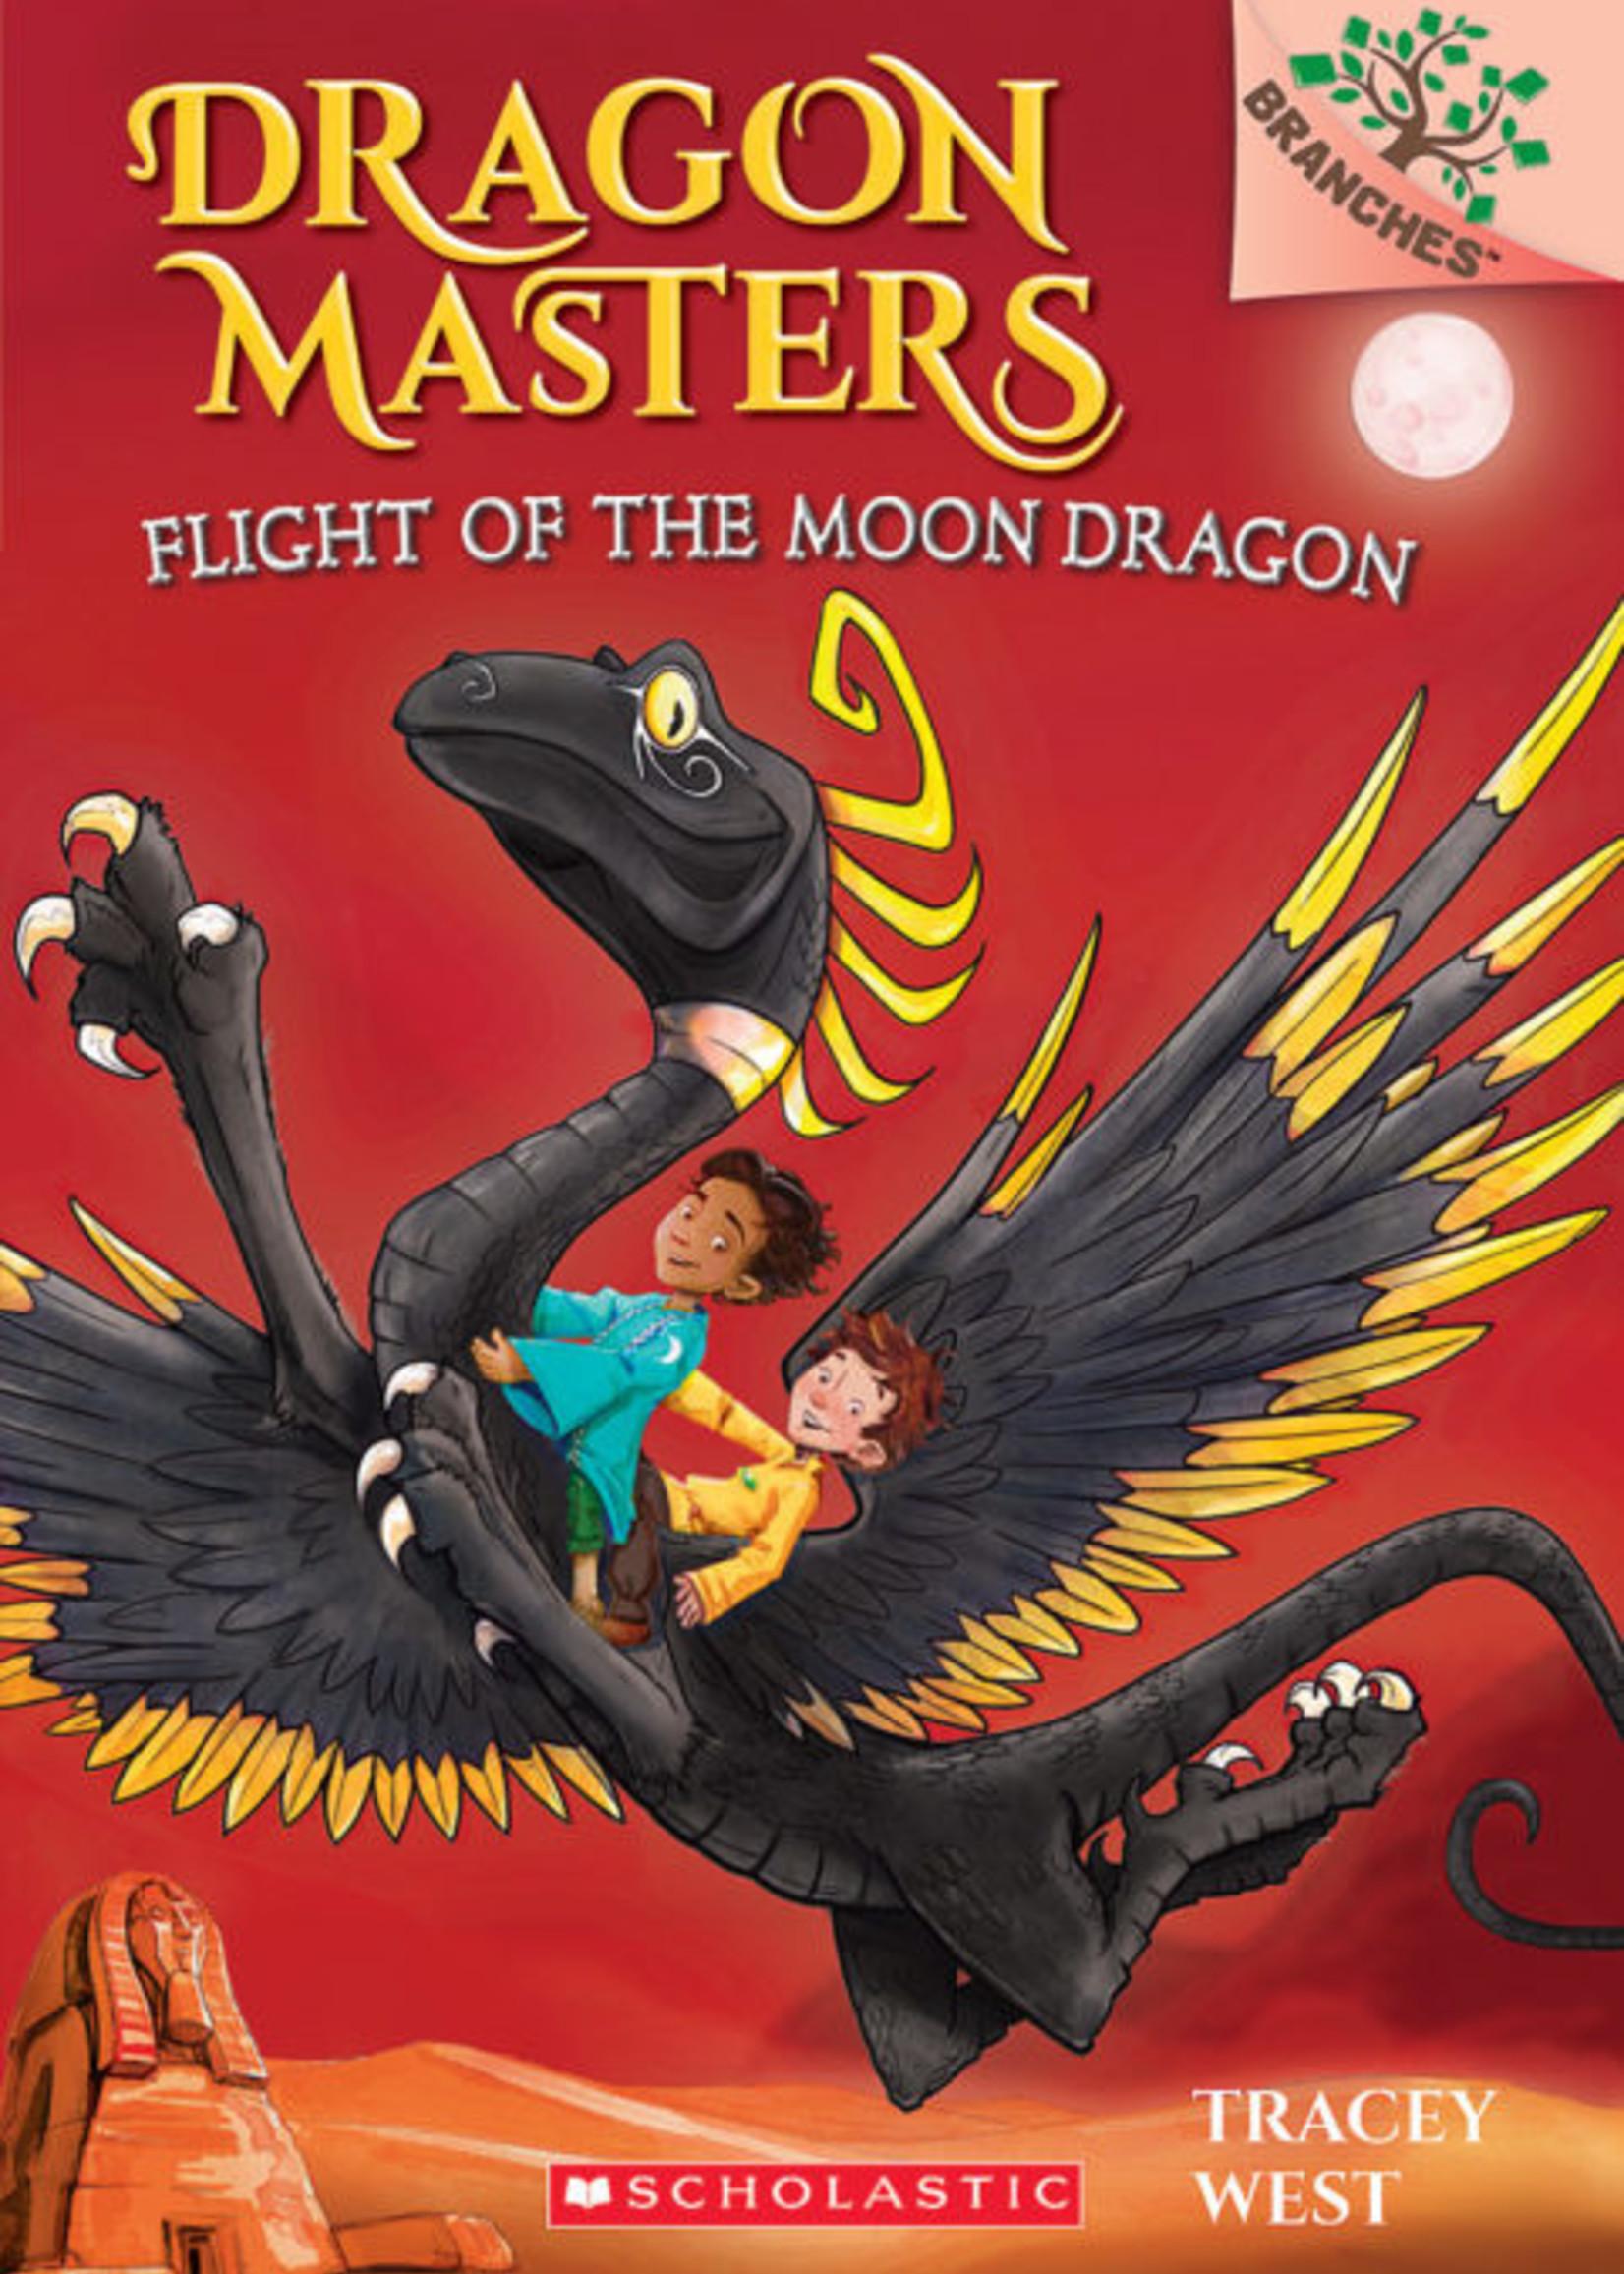 Dragon Masters #06, Flight of the Moon Dragon - Paperback